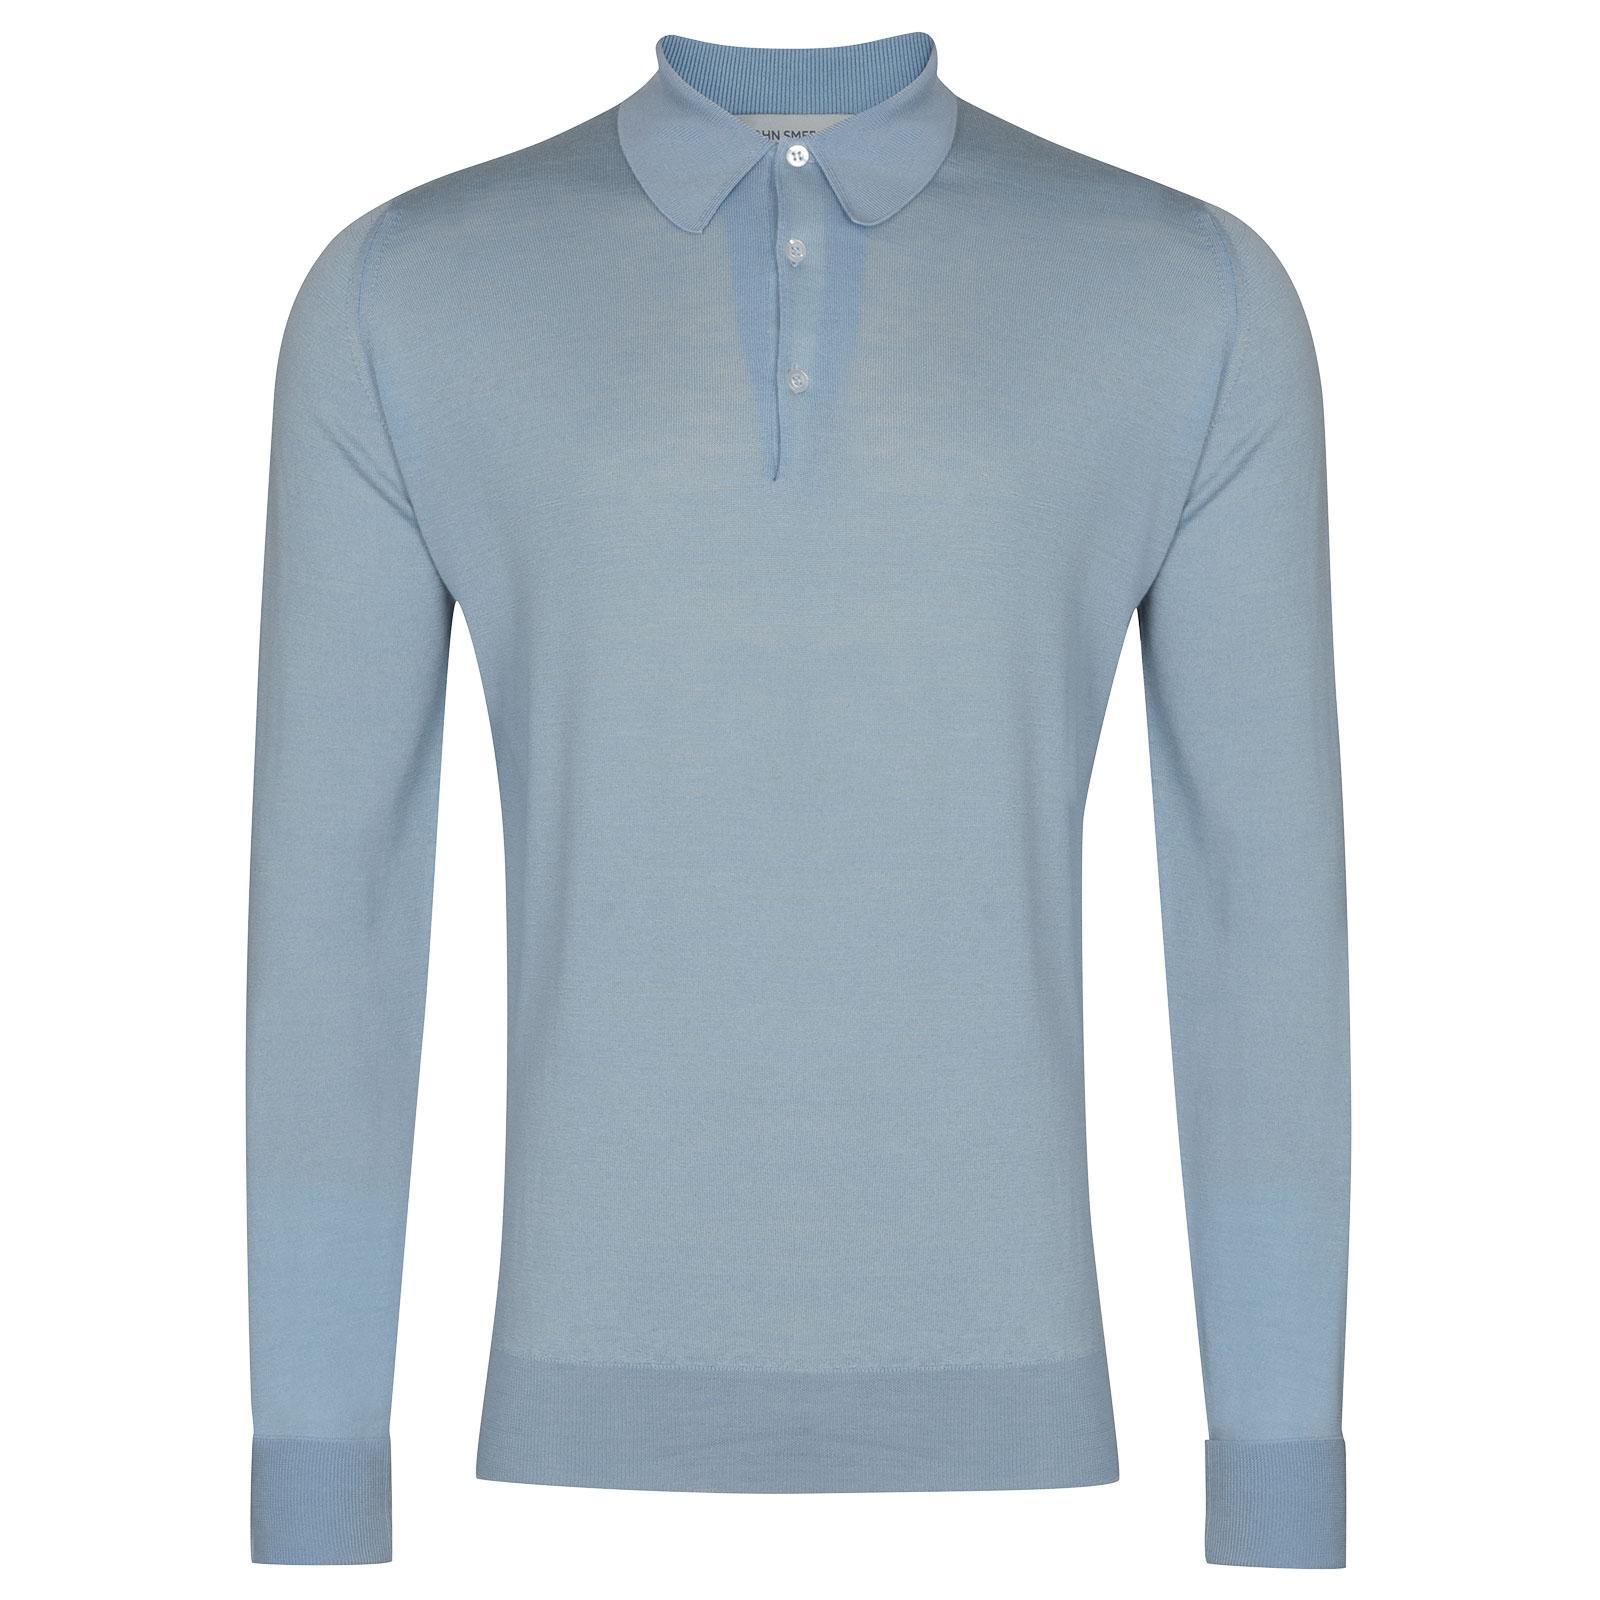 John Smedley Dorset in Dusk Blue Shirt-XXL